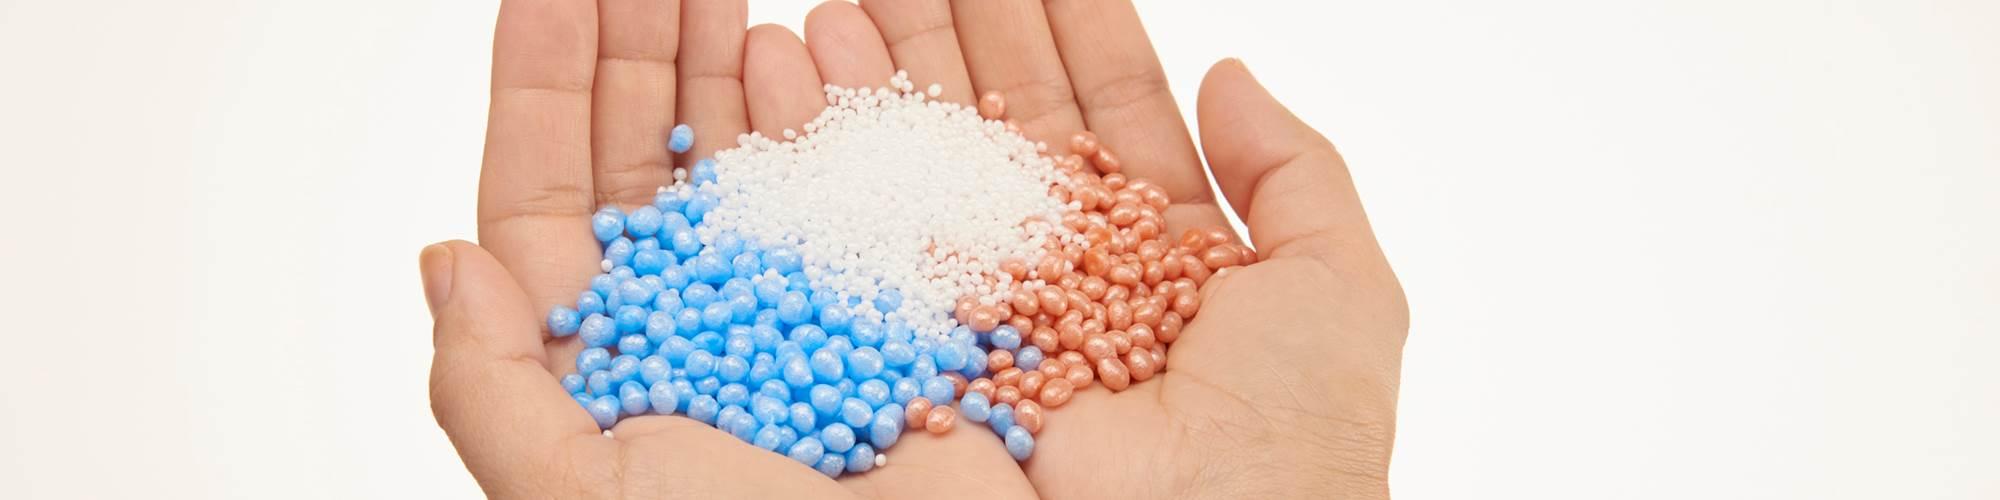 Perlas extruidas, de Sulzer Chemtech.